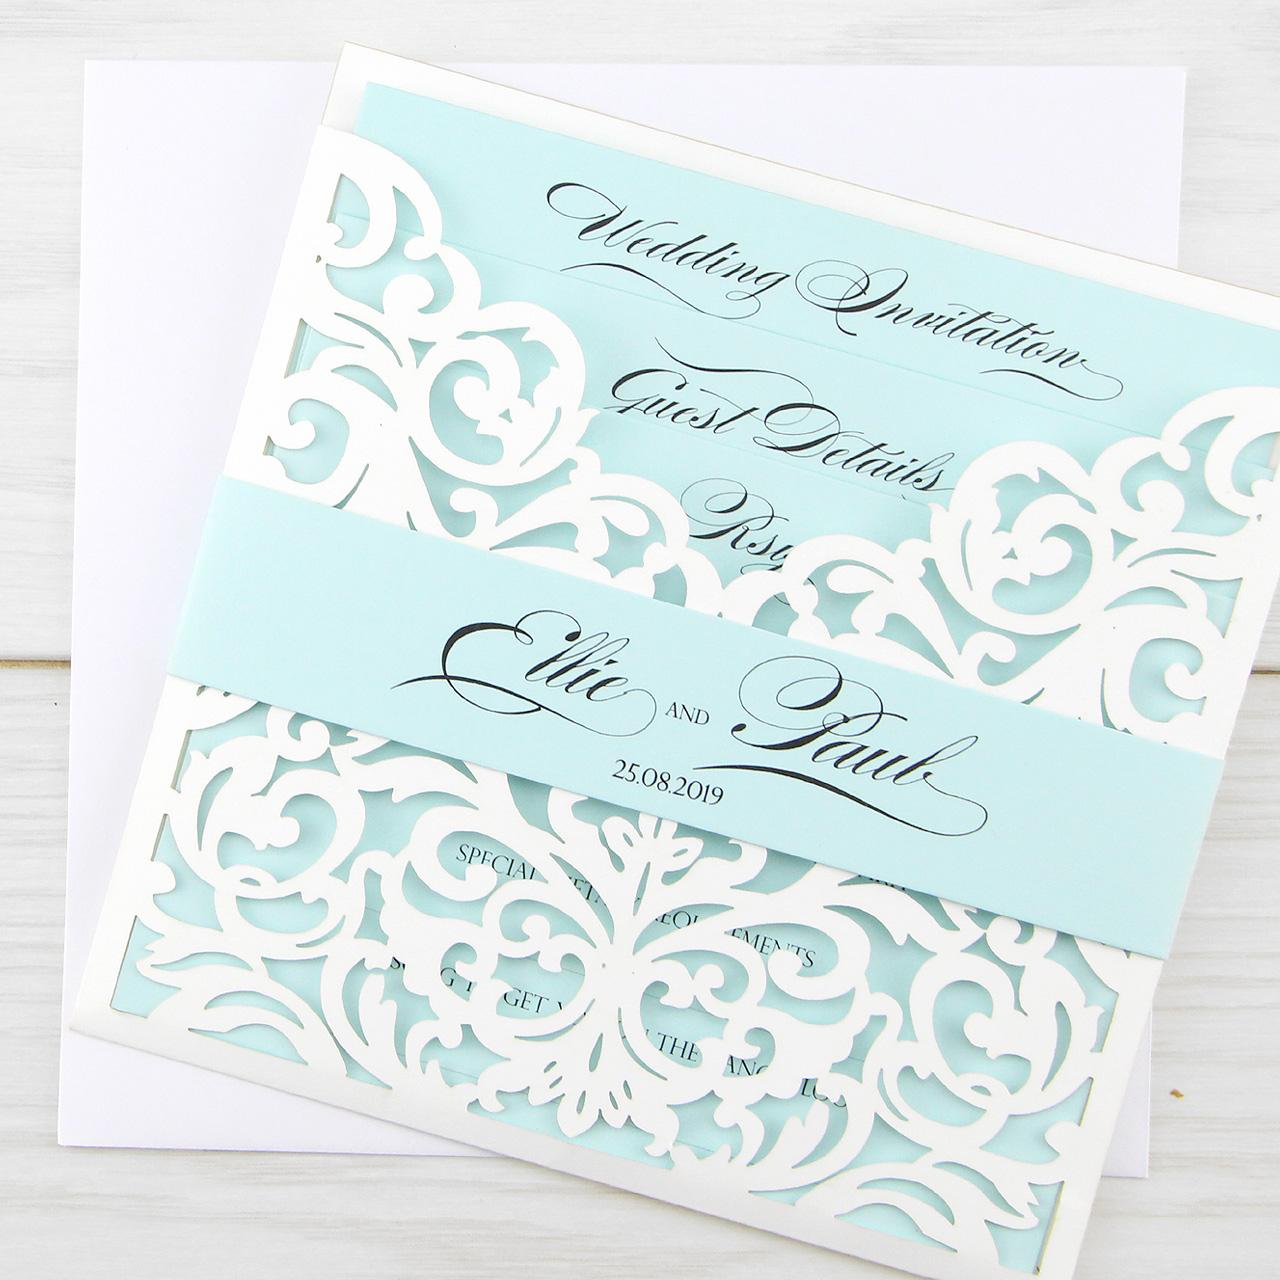 Images for cheap laser cut wedding invitations uk 91mobilemobilehd.cf